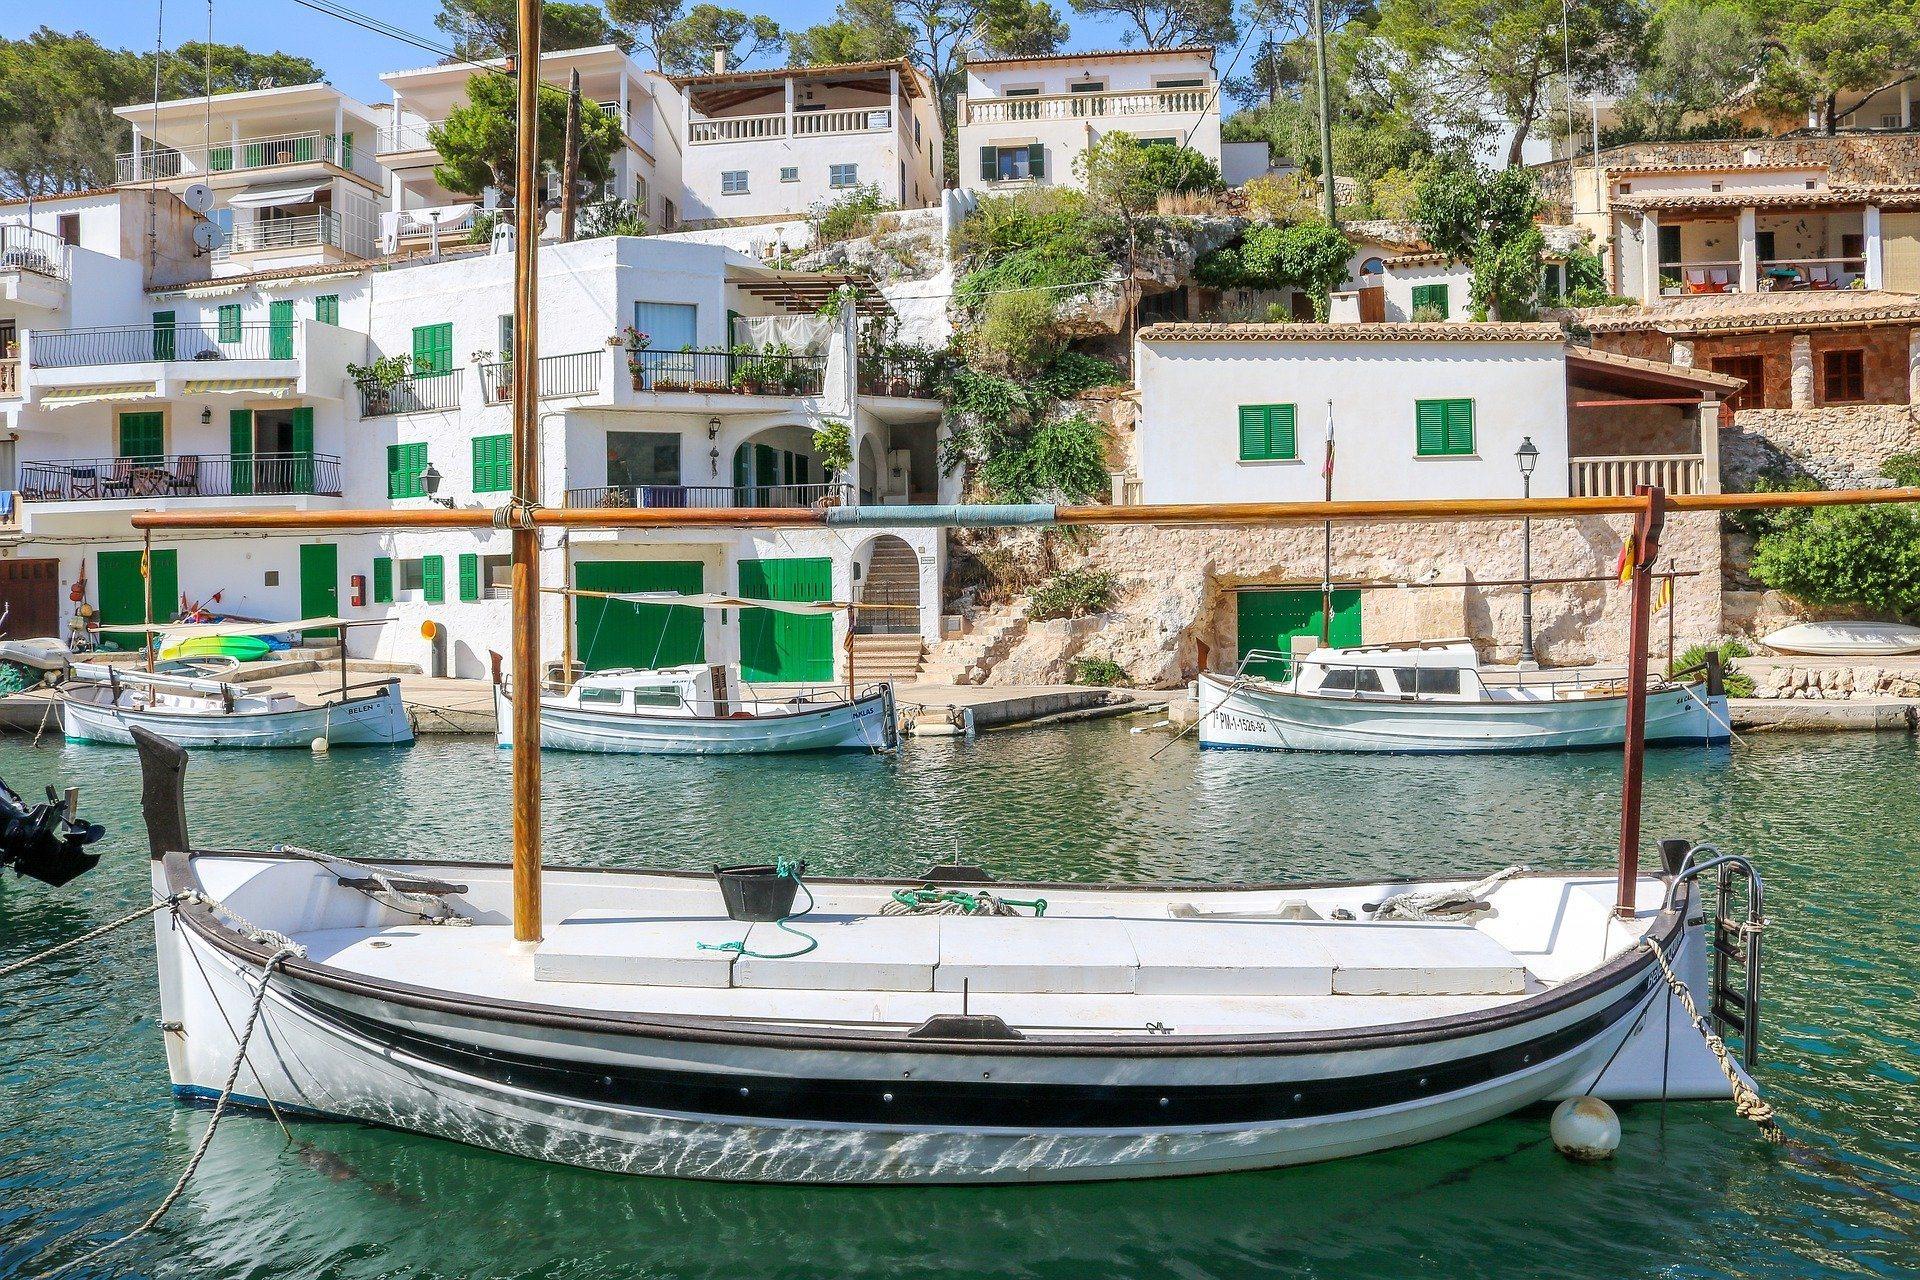 Cala Figuera in Mallorca Photo: Nicole Pankalla Pixabay